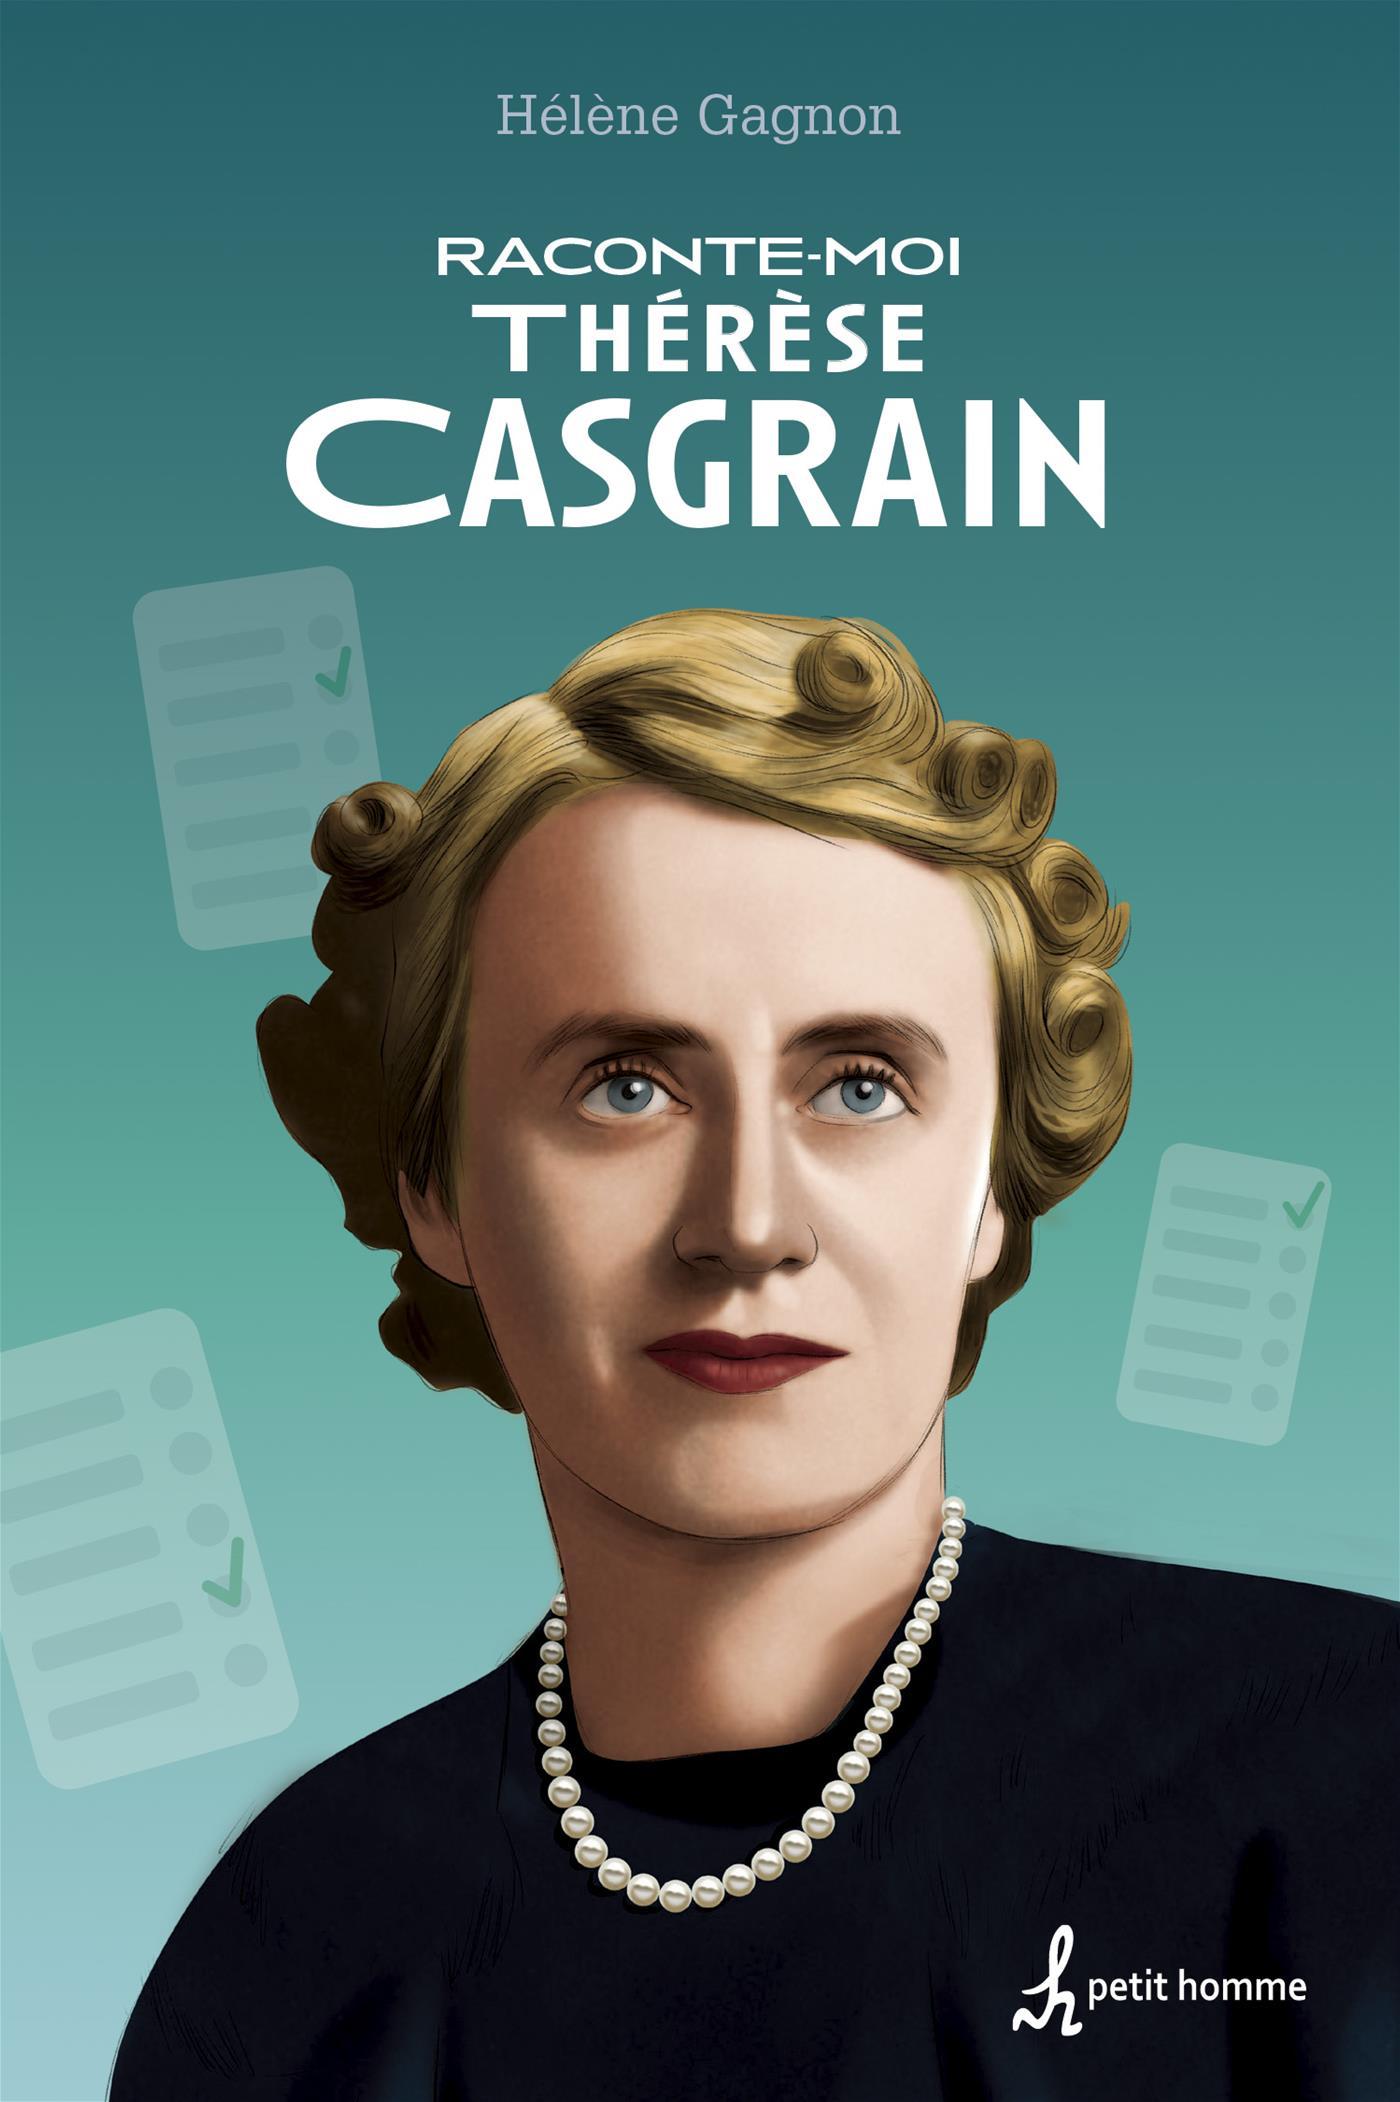 Raconte-moi Thérèse Casgrain - Nº 42